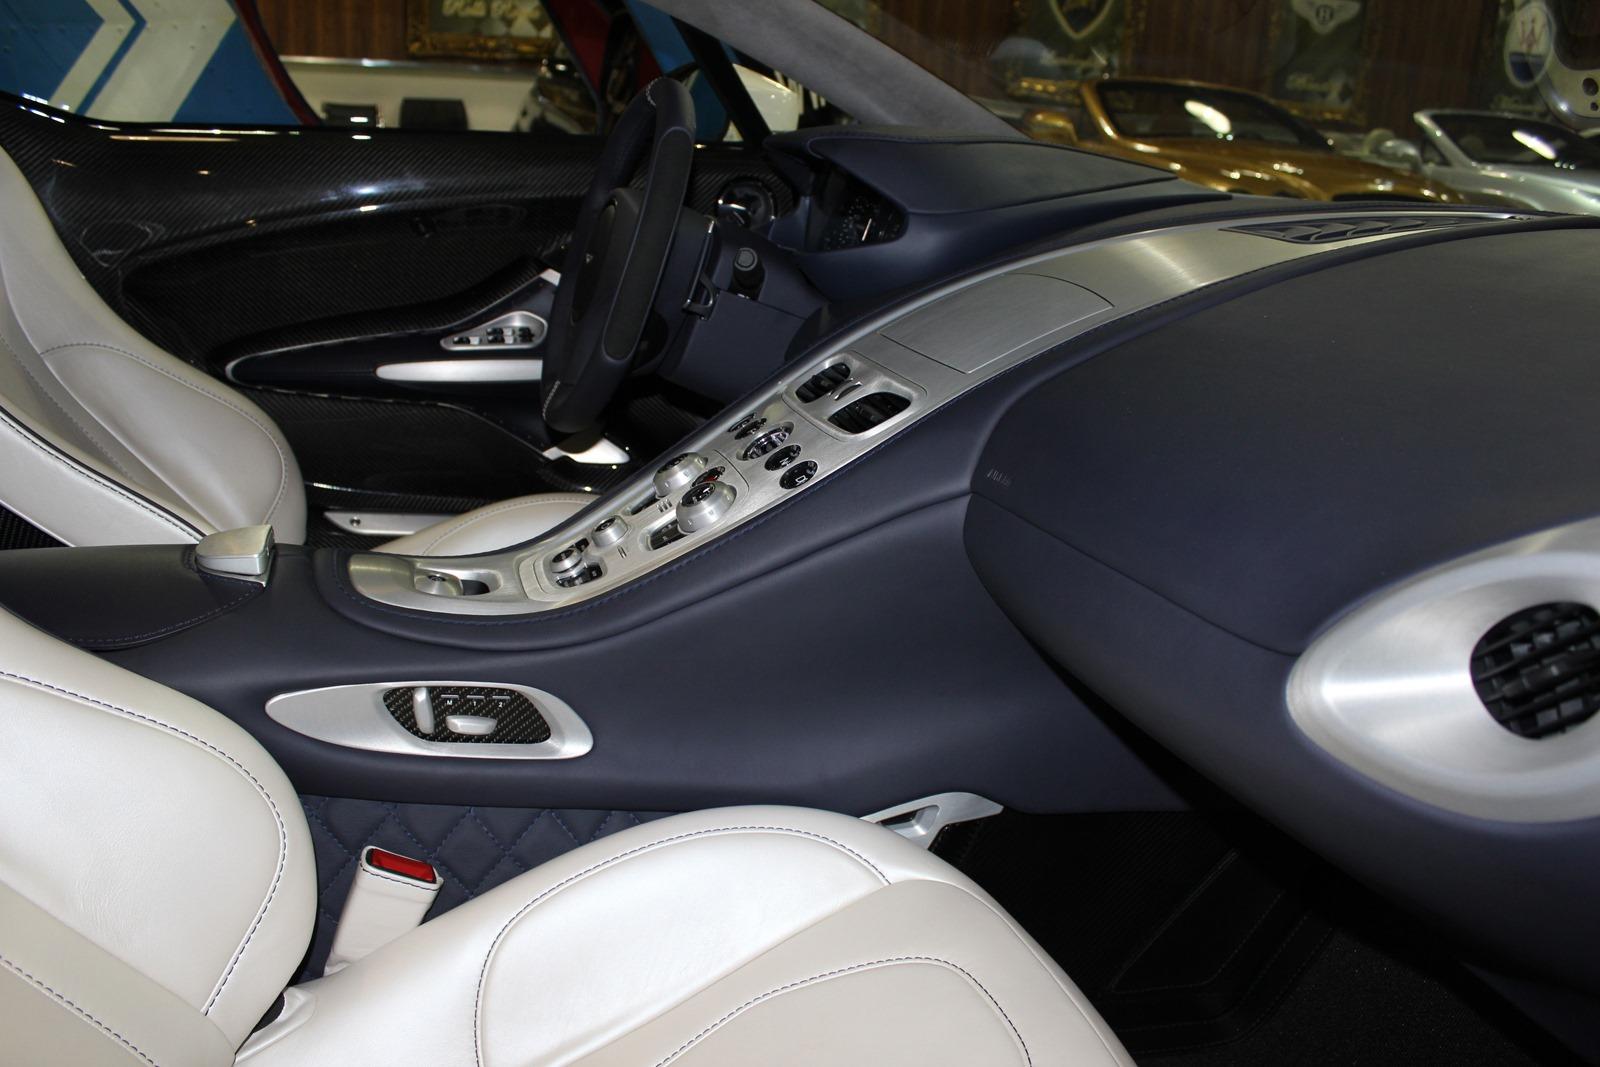 Aston-Martin-One-77-16%25255B3%25255D.jpg